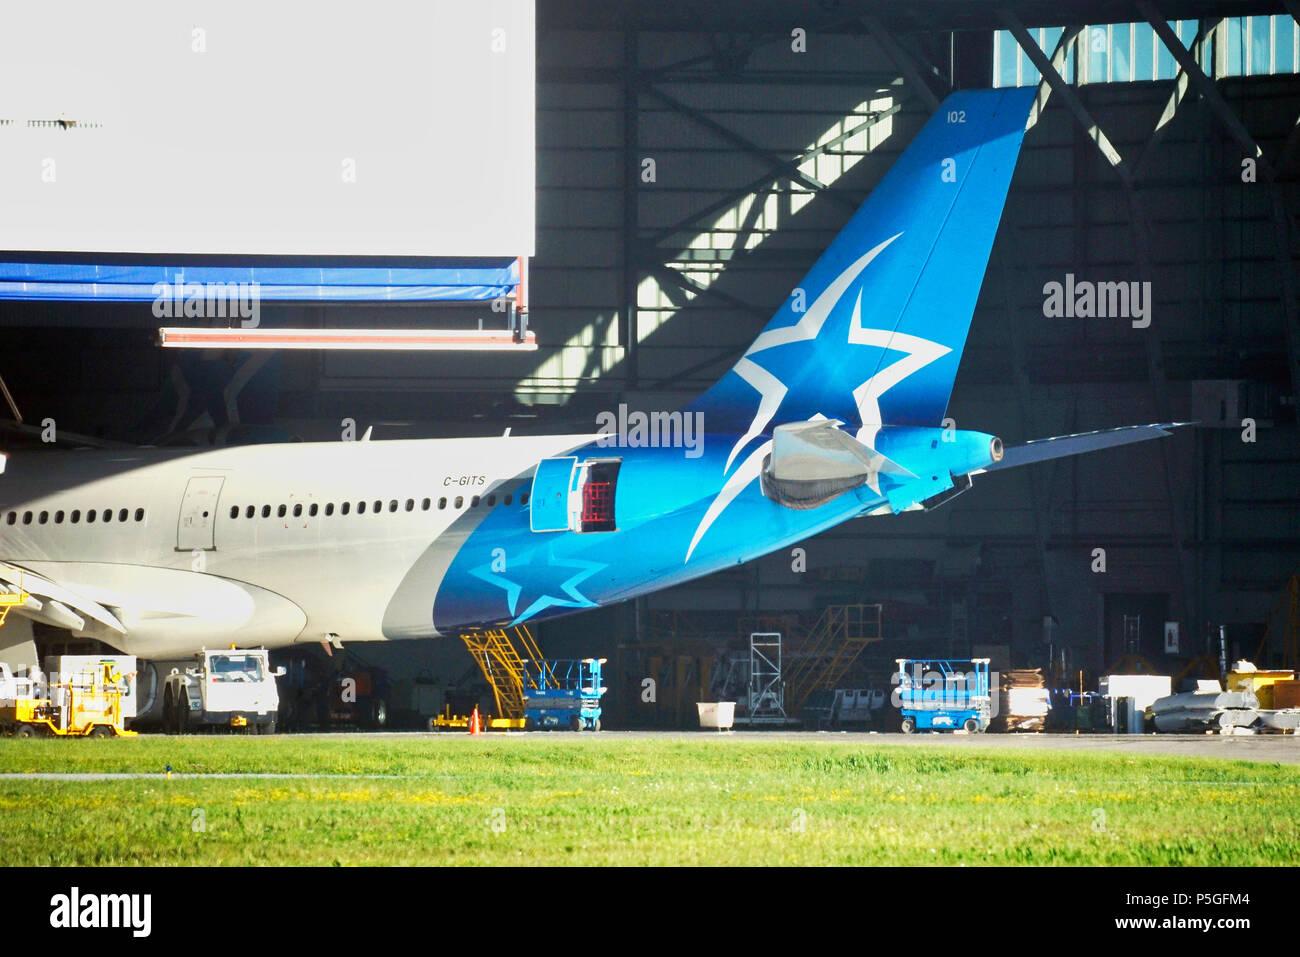 Montreal,Canada, 25 June 2018. Air Transat passenger jet in its maintenance hanger at Trudeau International airport.Credit:Mario Beauregard/Alamy Live - Stock Image